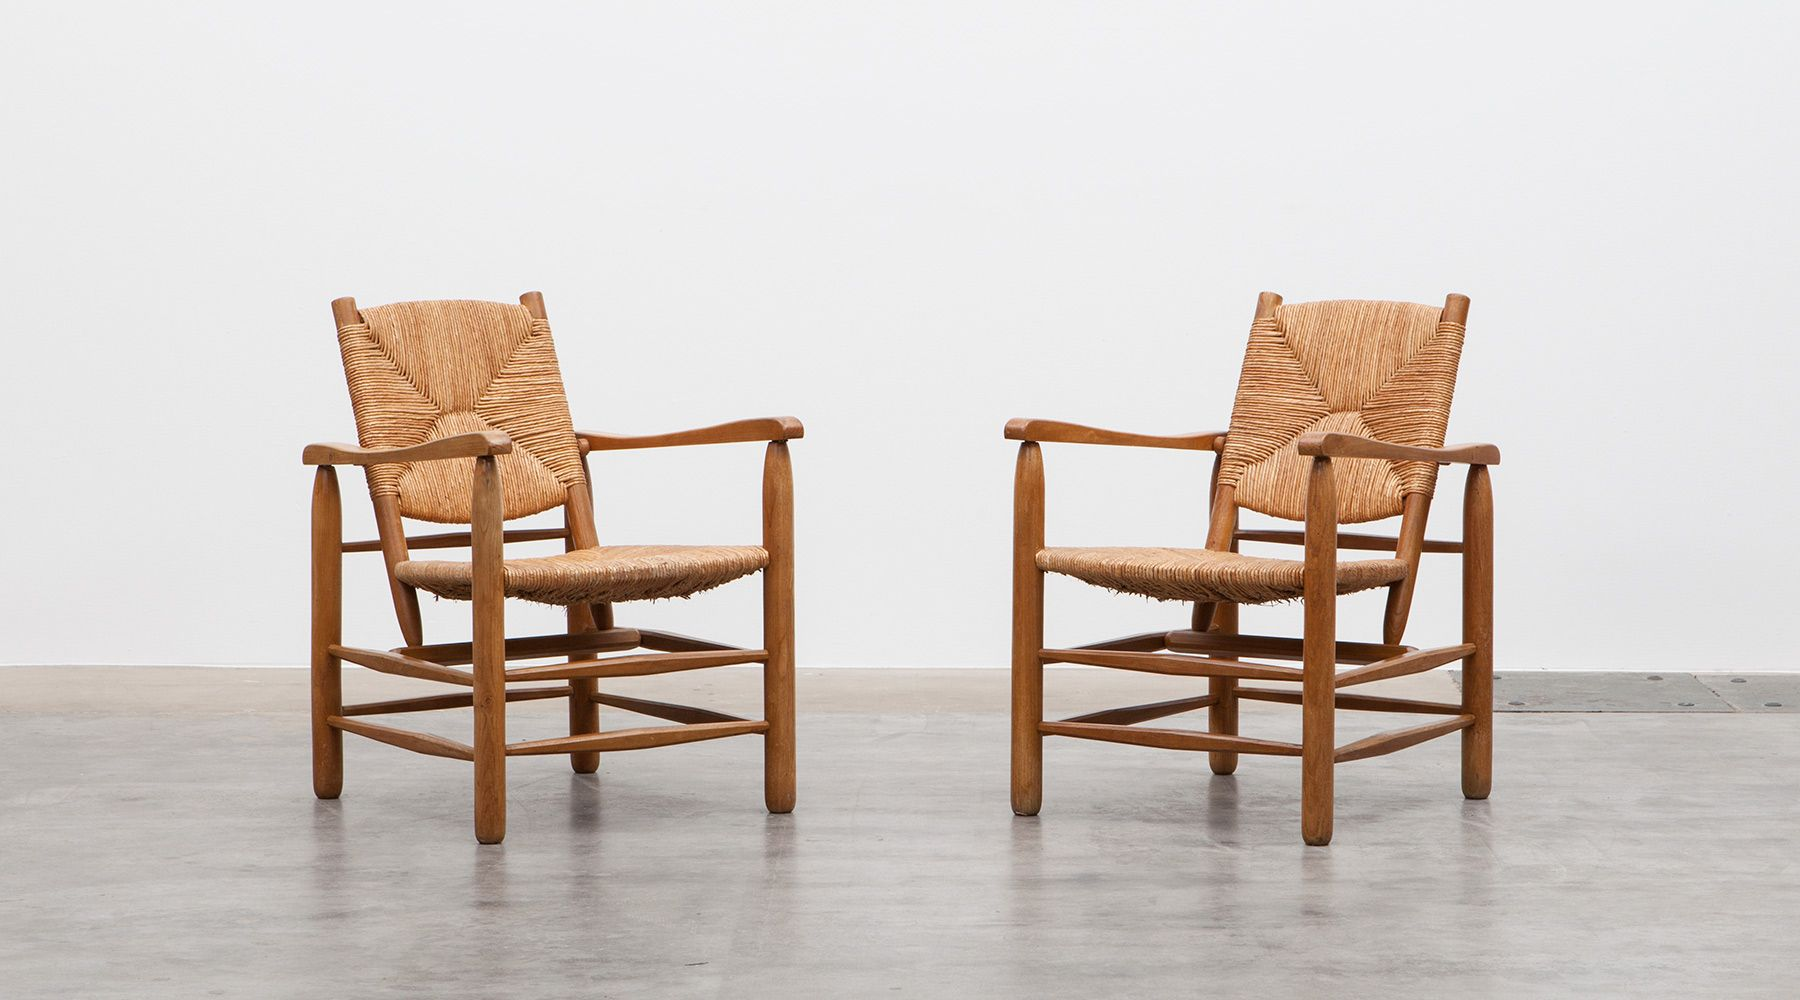 Brilliant Lounge Chairs 2 By Charlotte Perriand Frank Landau Inzonedesignstudio Interior Chair Design Inzonedesignstudiocom